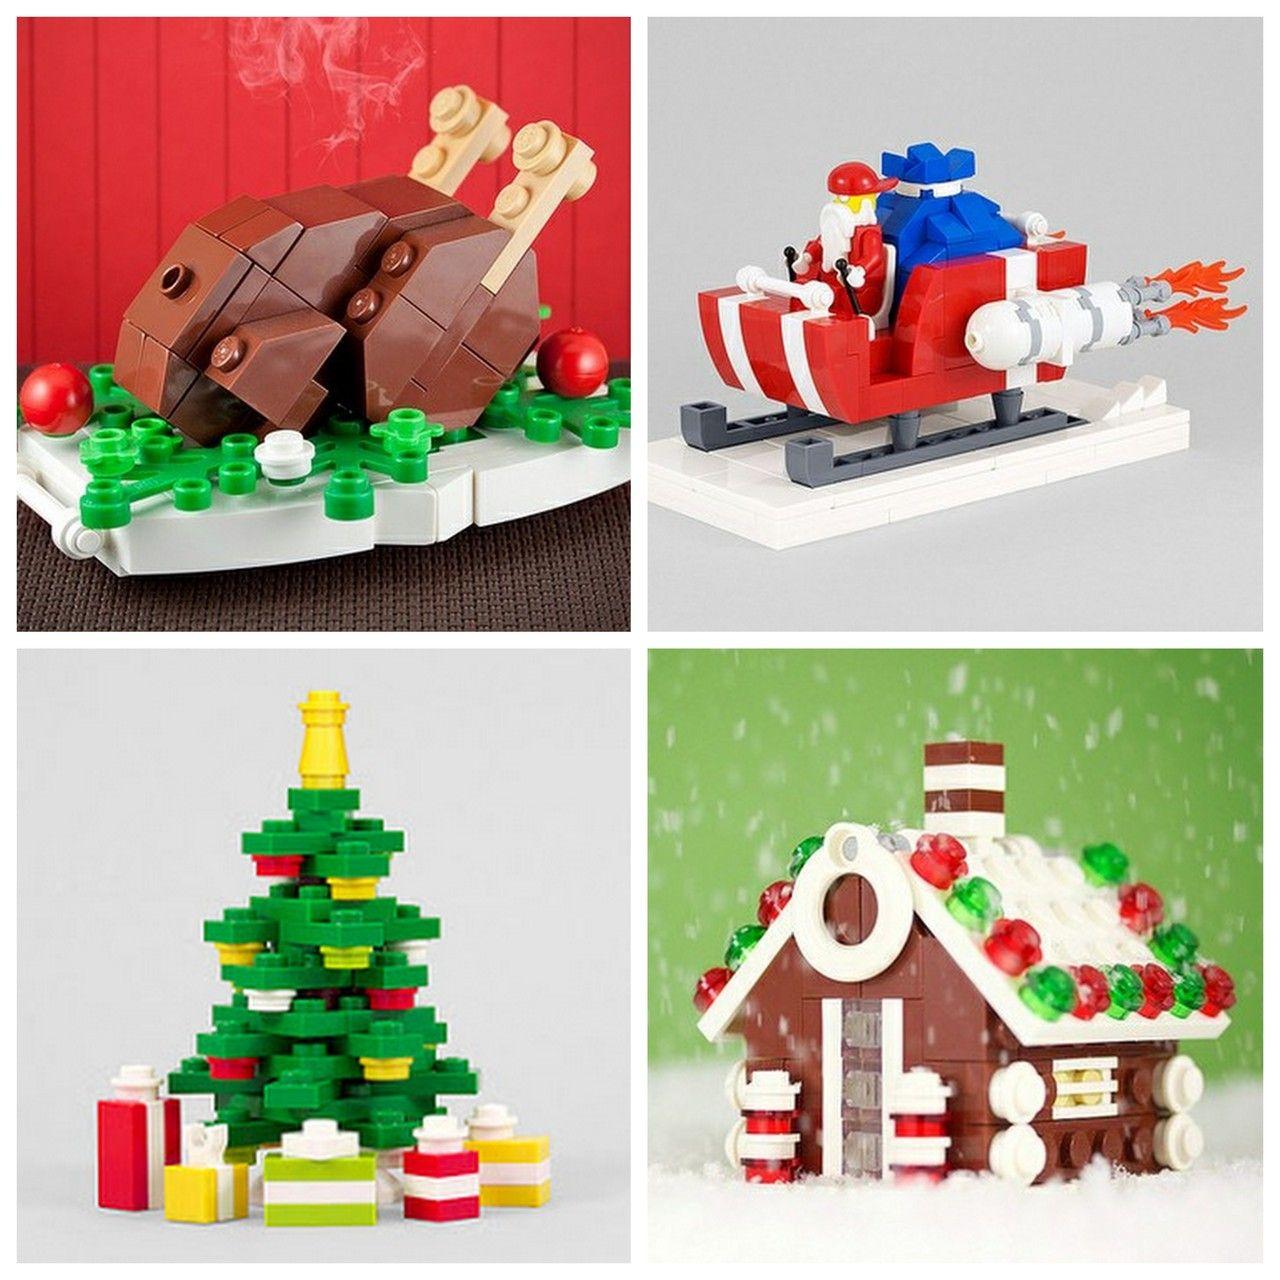 Leggo Christmas Decorations Lego Christmas Lego Christmas Ornaments Lego Christmas Village